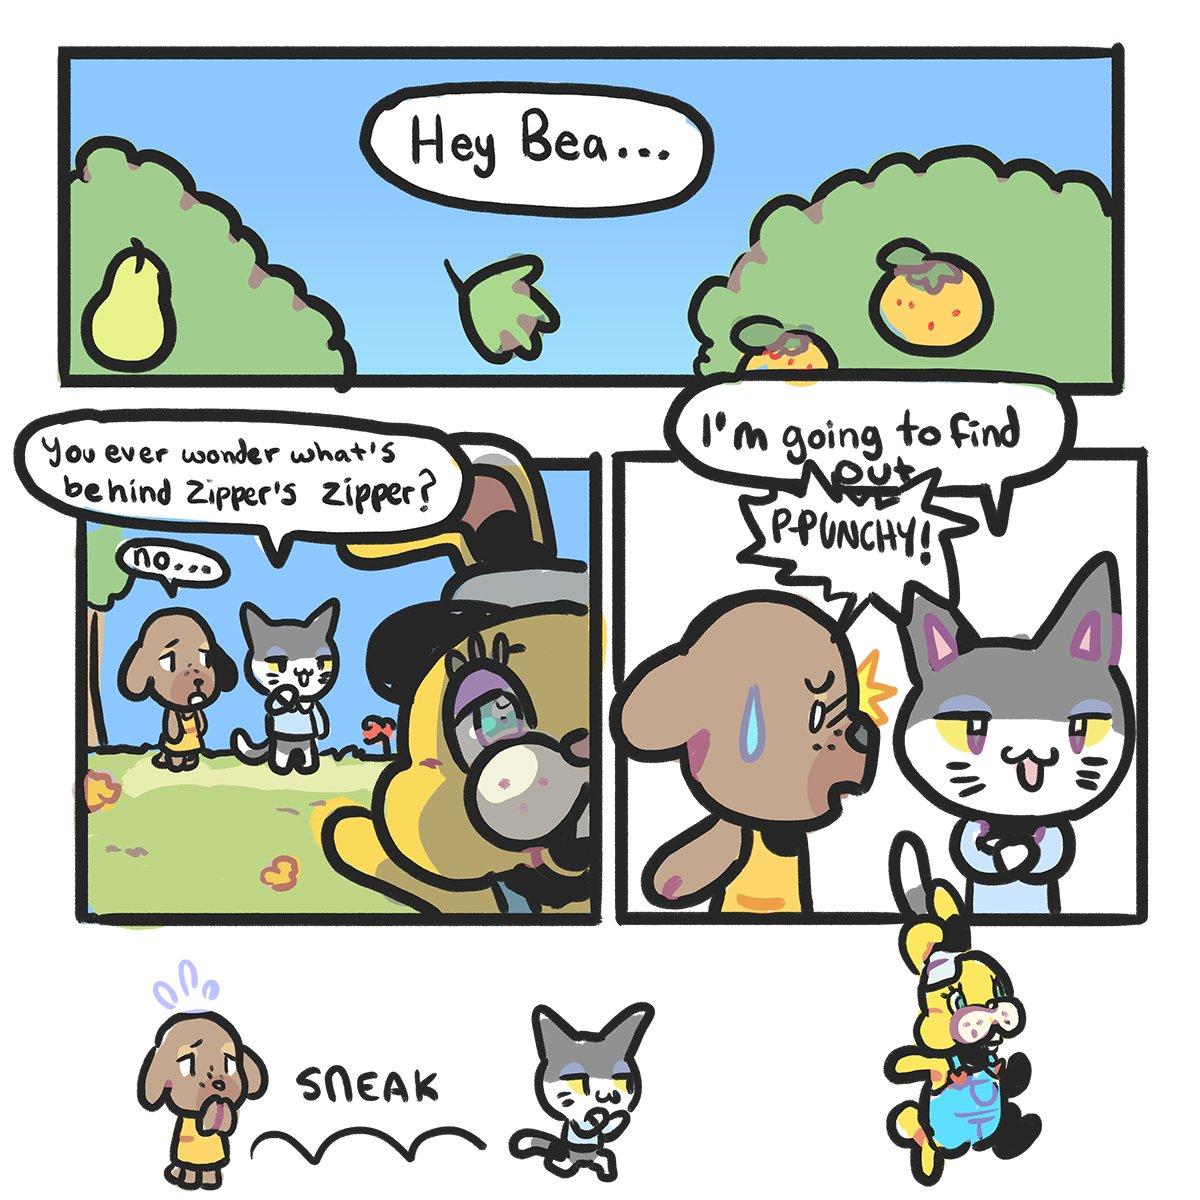 RT @eisorus: curiosity killed the cat https://t.co/KWH16Z5mf3